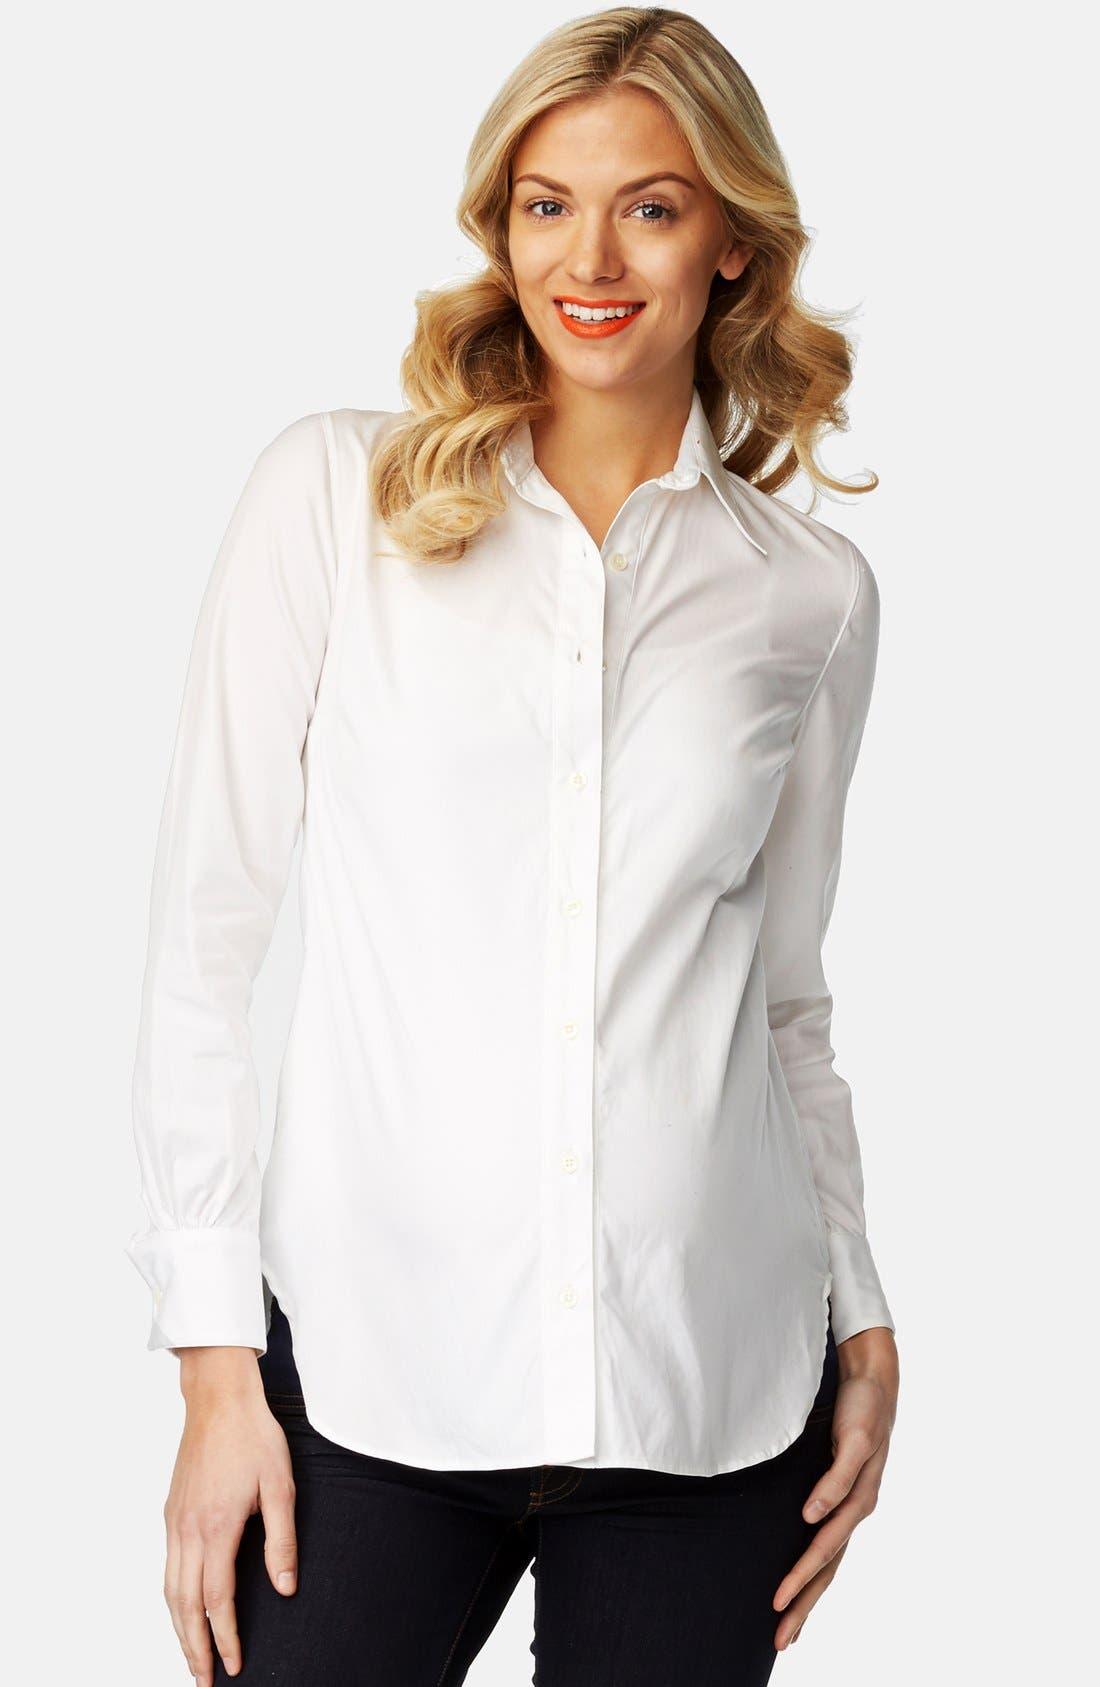 ROSIE POPE 'Classic' Maternity Shirt in White